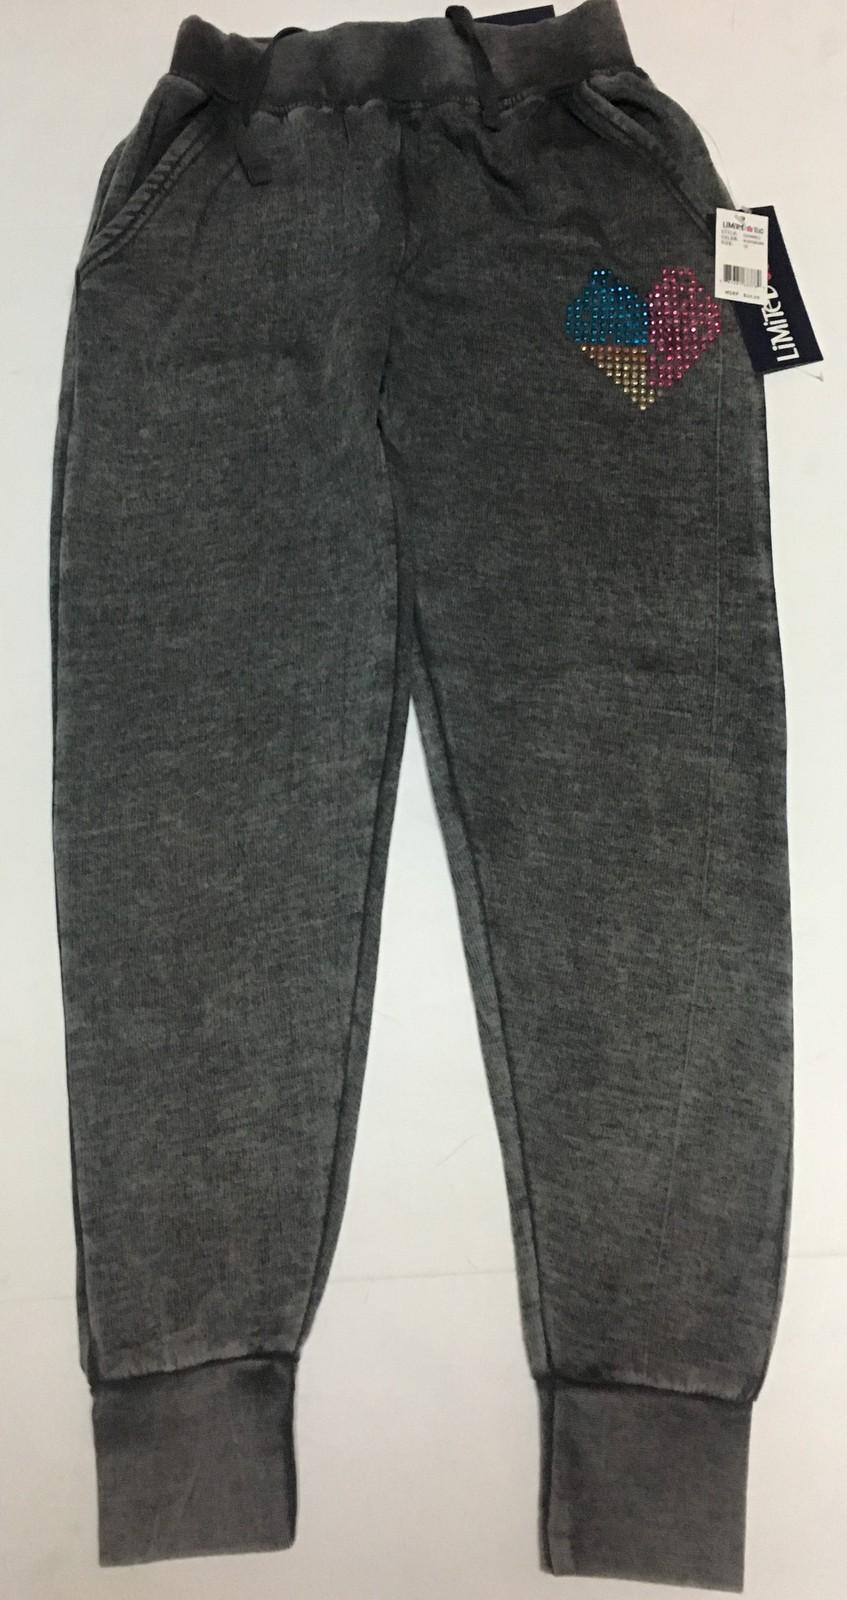 Limited Too Heather Grey Sweatpants Youth Sz 7/8 Embellished Heart NWT